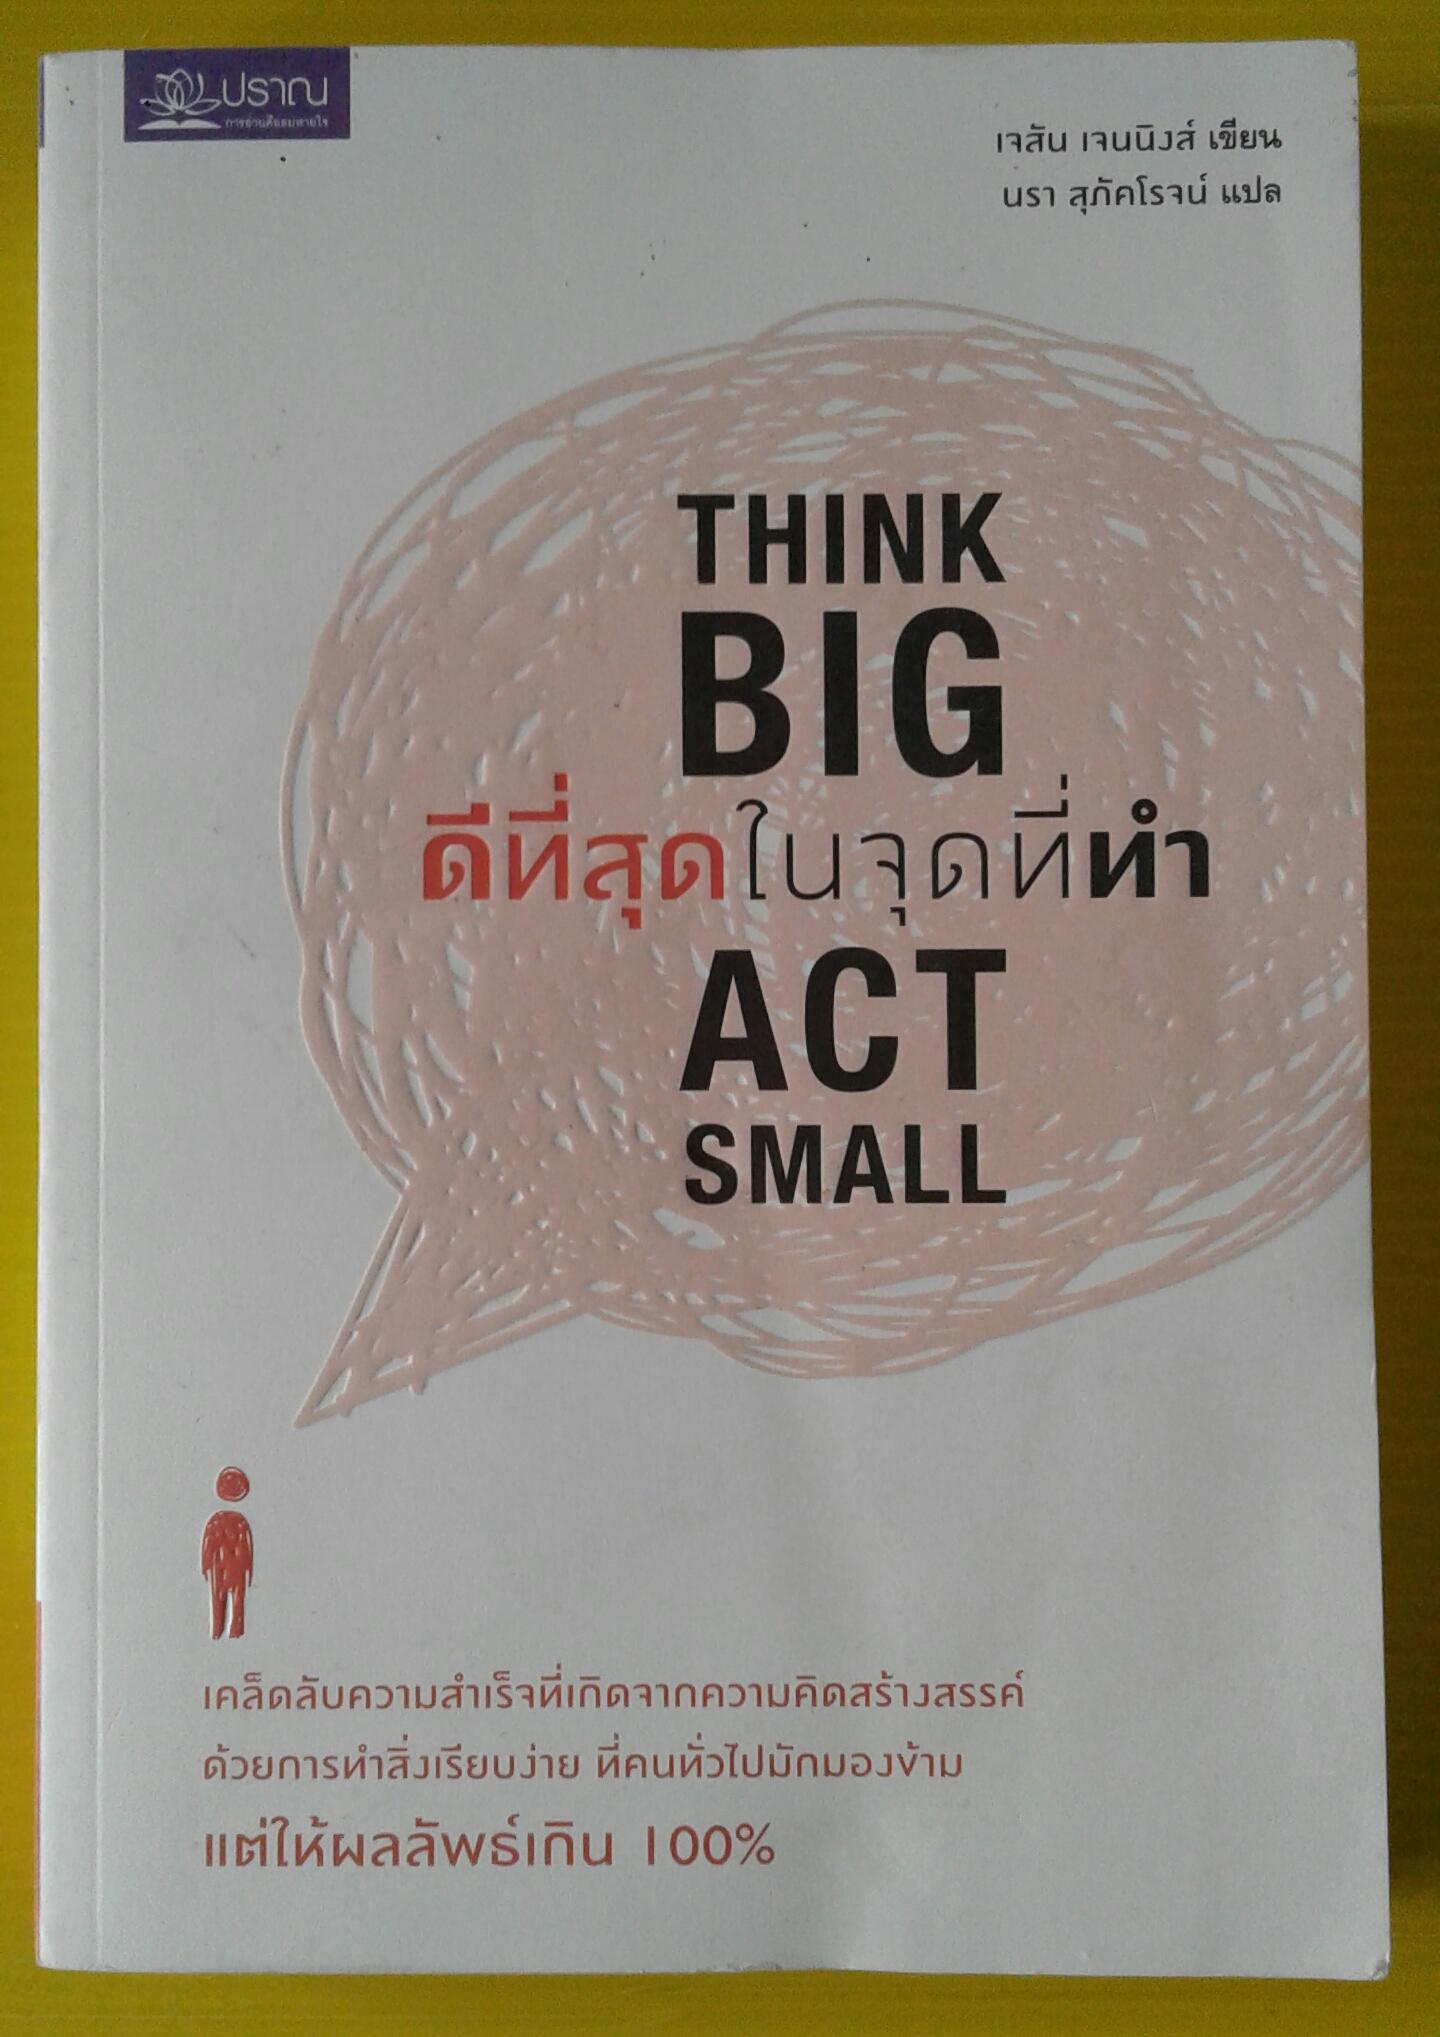 THINK BIG ACT SMALL ดีที่สุดในจุดที่ทำ